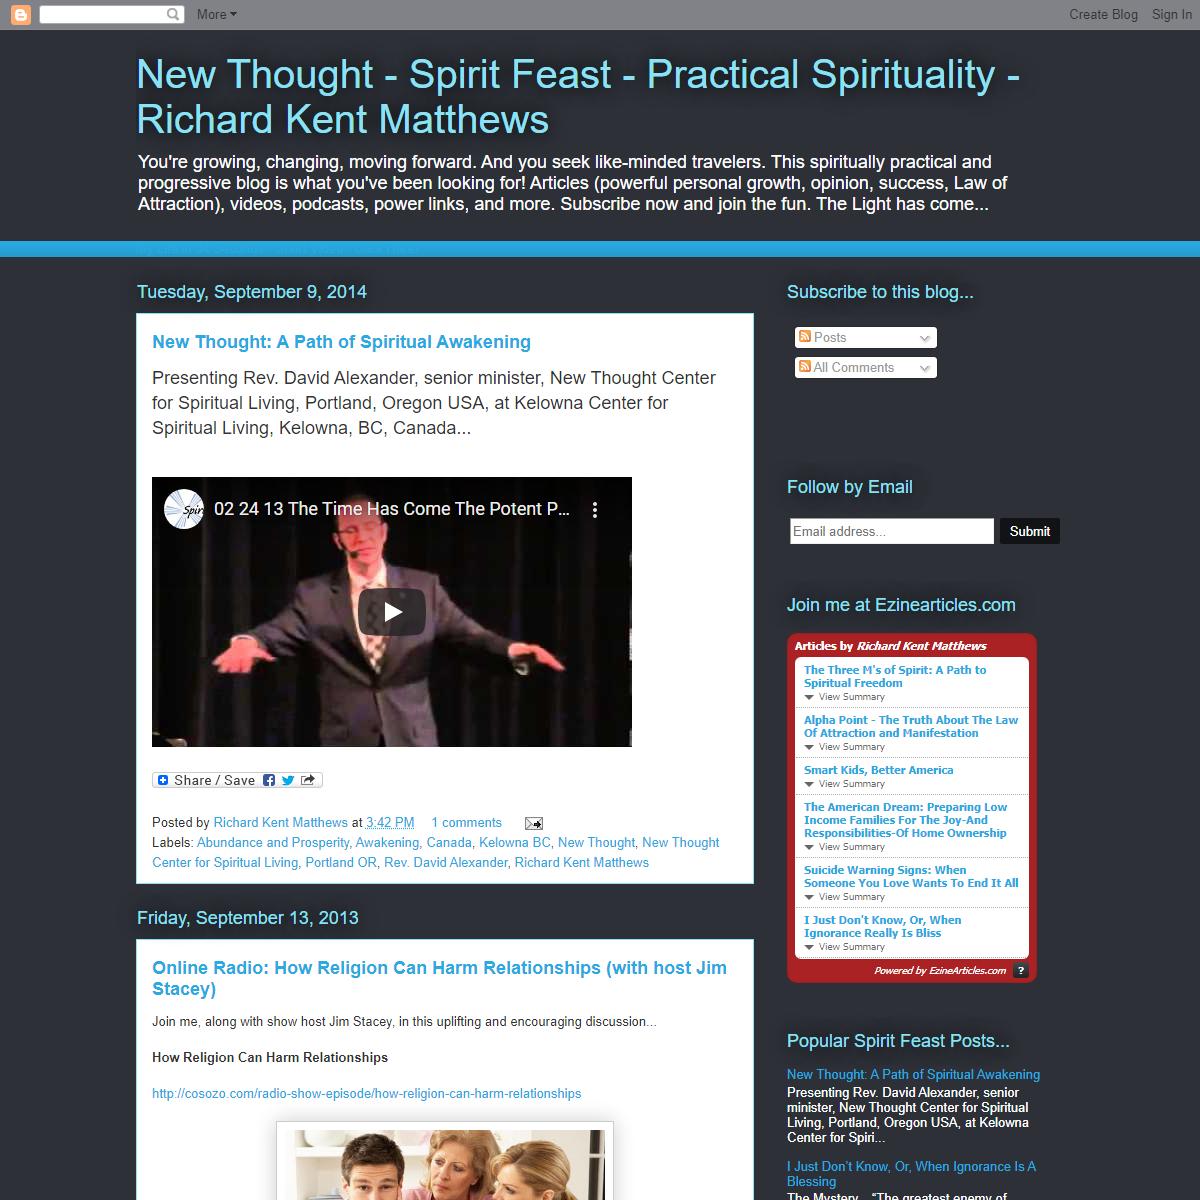 New Thought - Spirit Feast - Practical Spirituality - Richard Kent Matthews